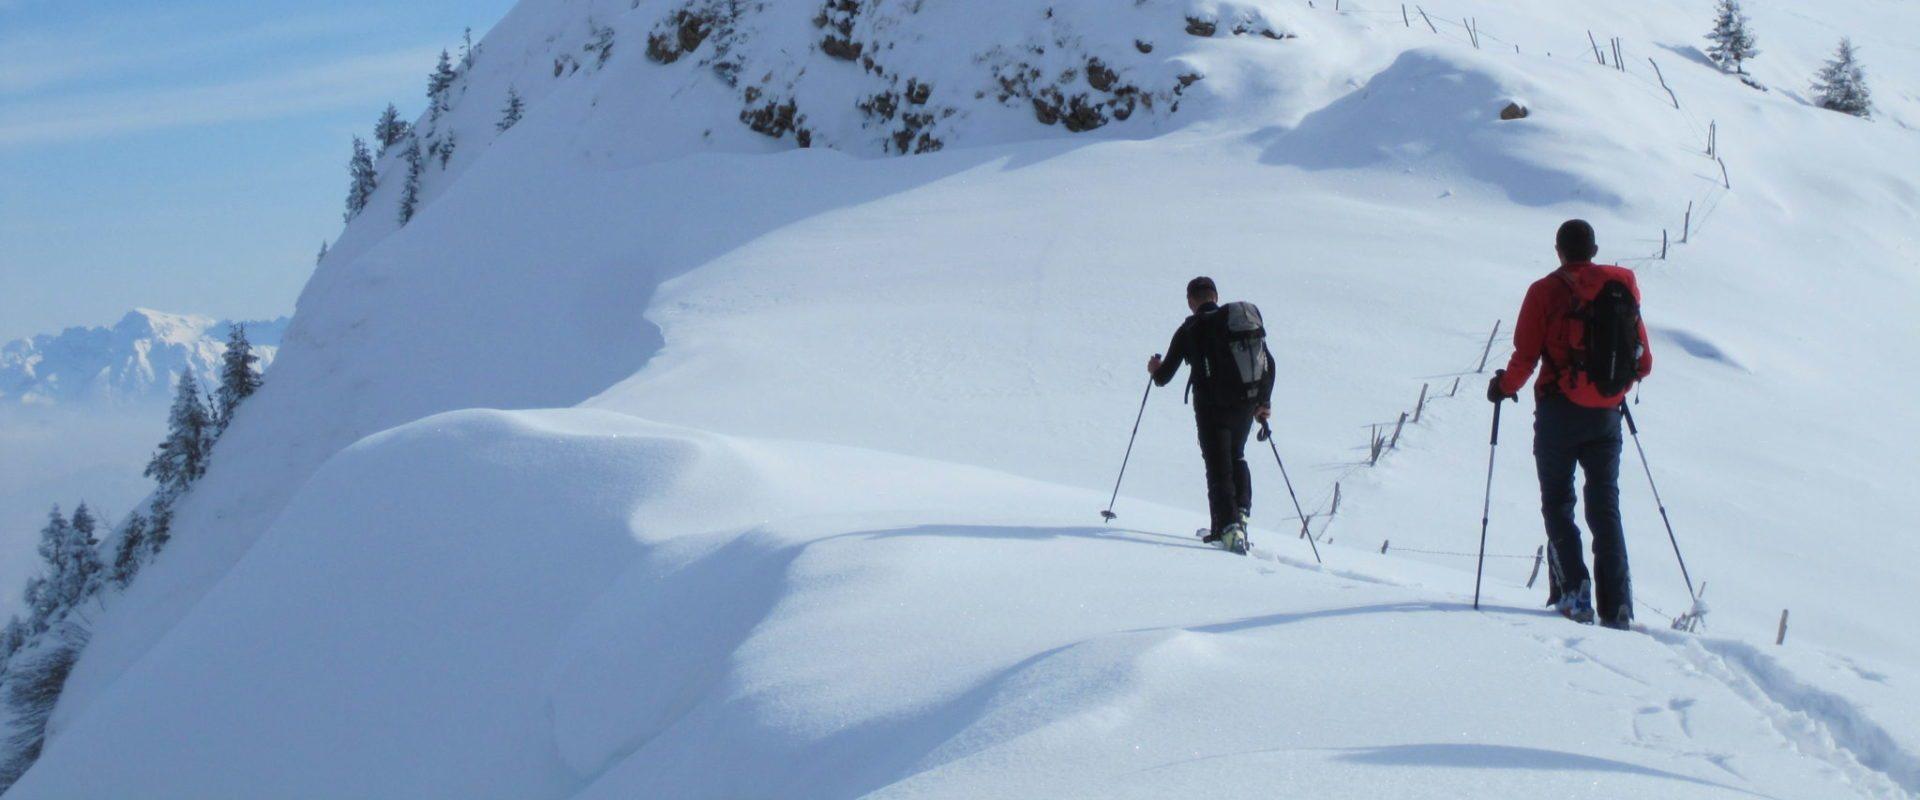 Winterstaude (1,877 m) ski tour for advanced skiers